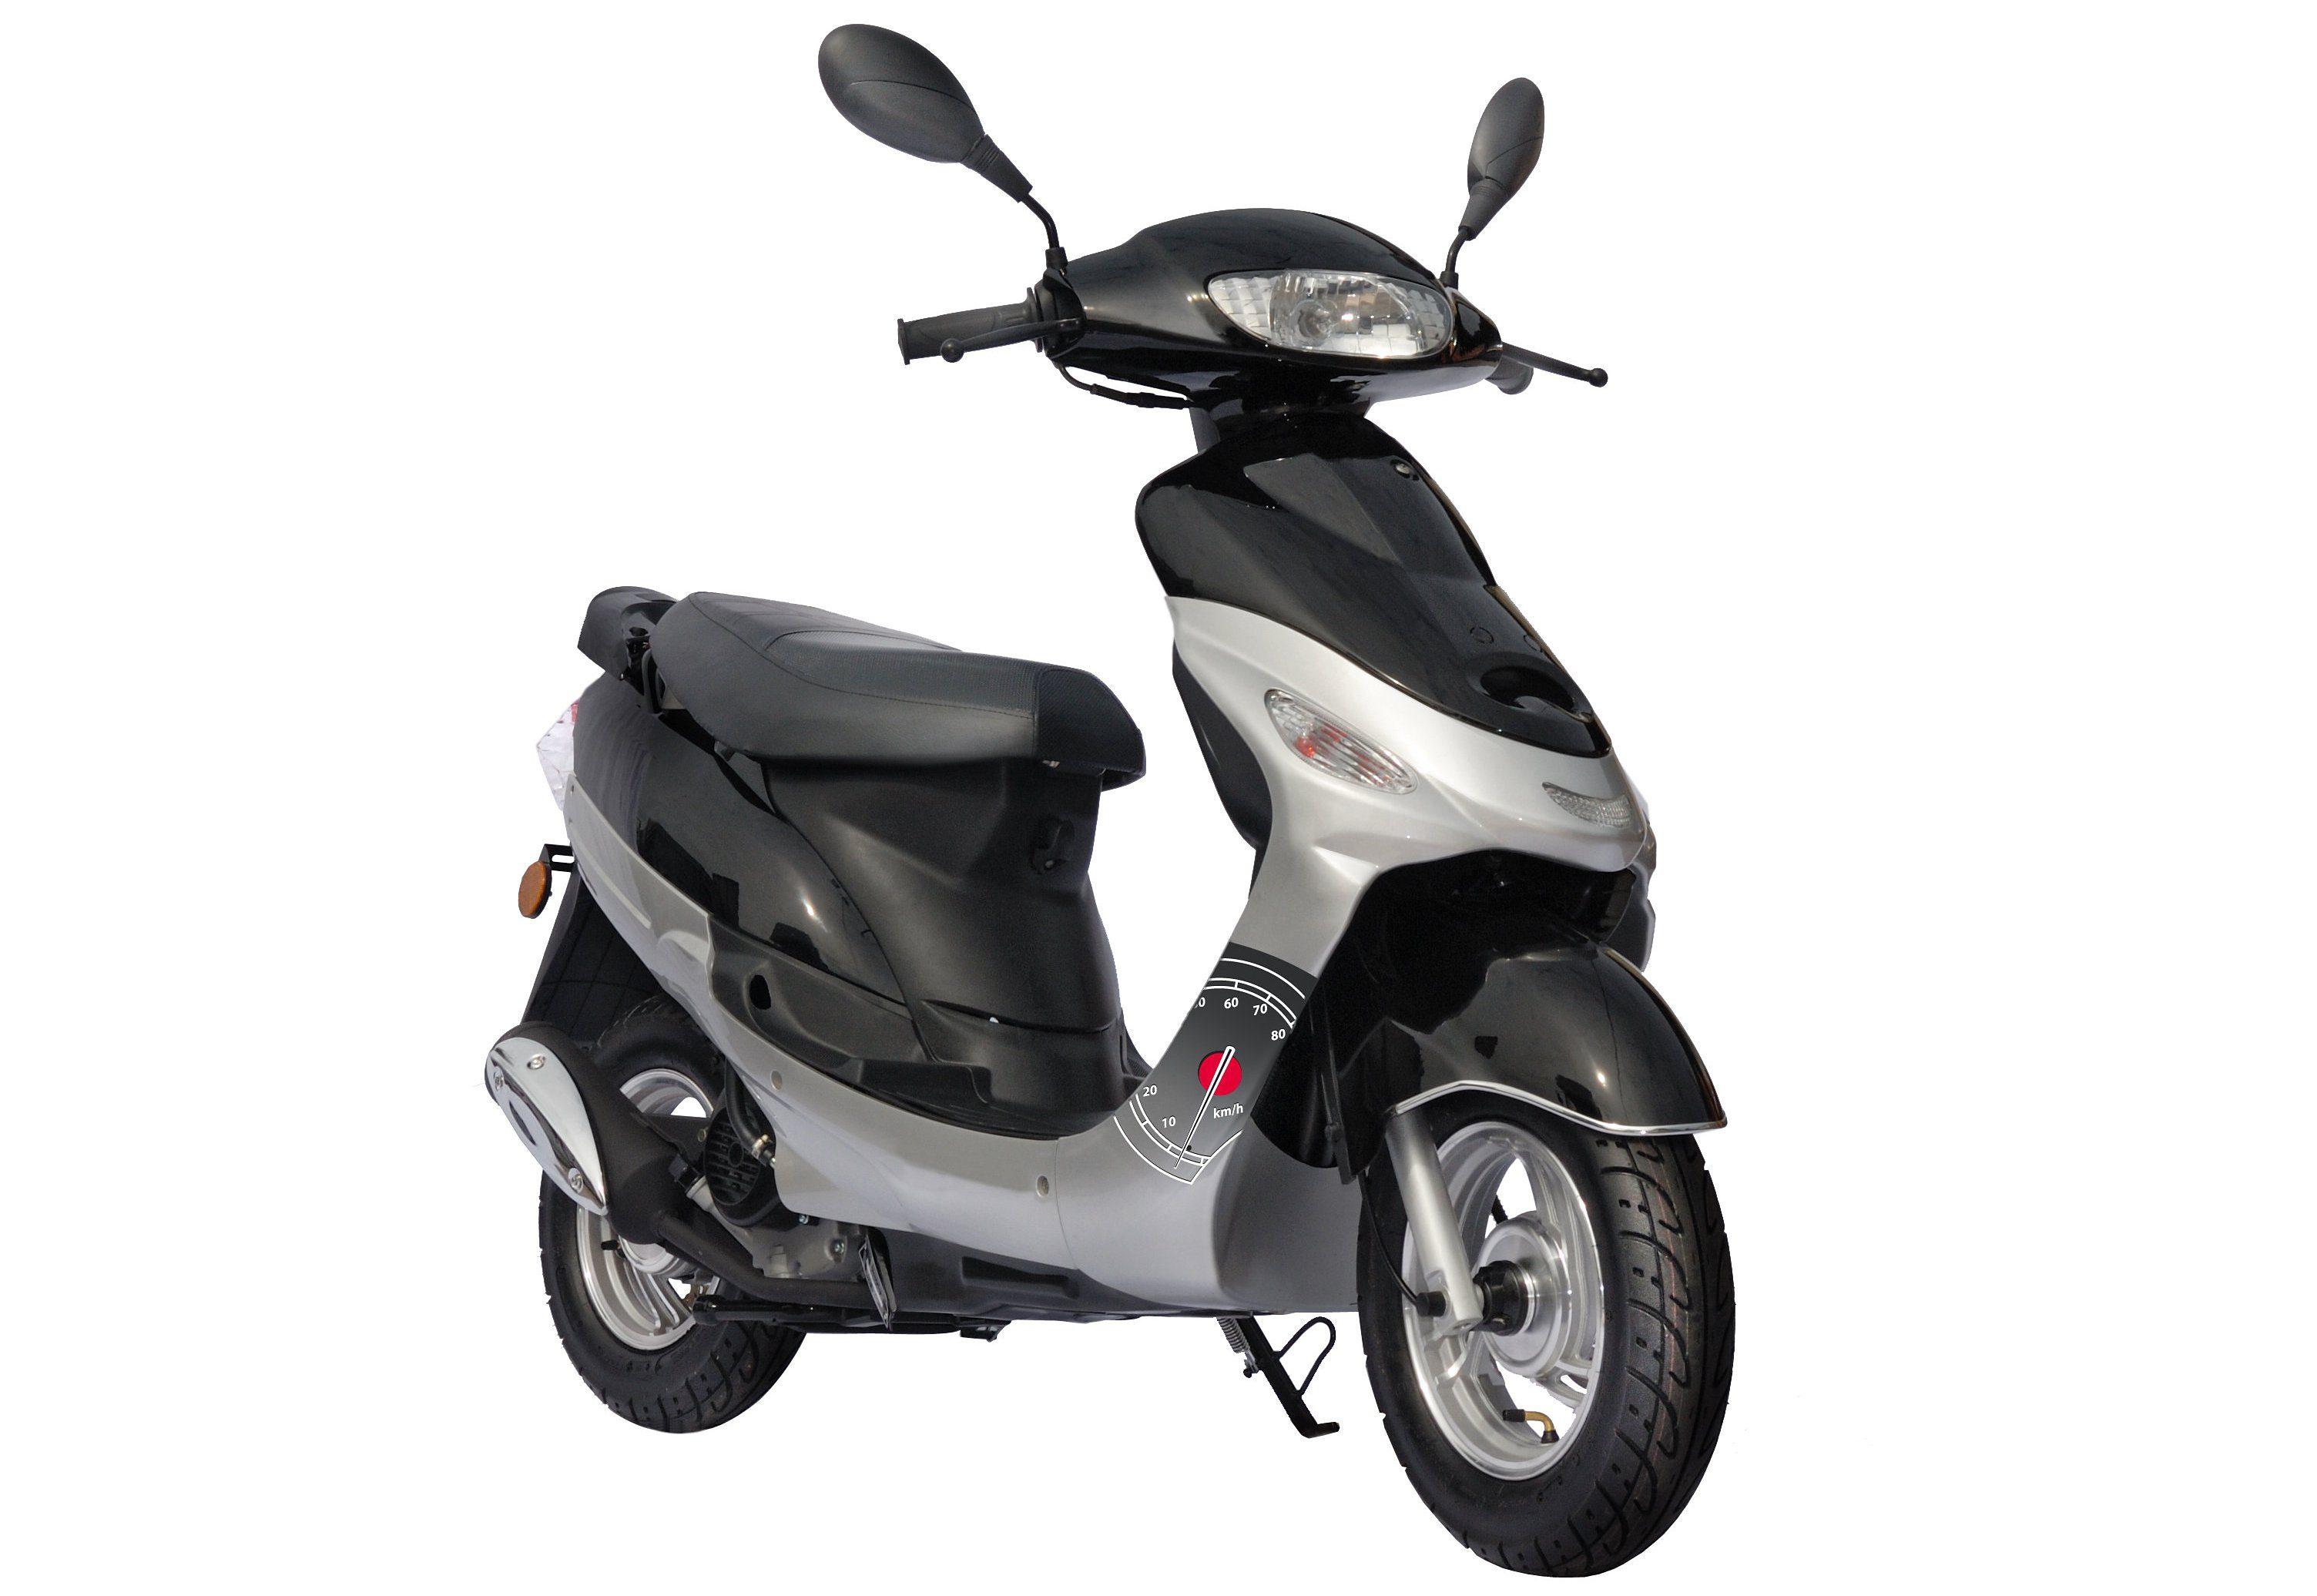 Motorroller inkl. Spiegel, Nova Motors, »Eco Fox«, 50 ccm 45 km/h, silber-schwarz oder rot-schwarz